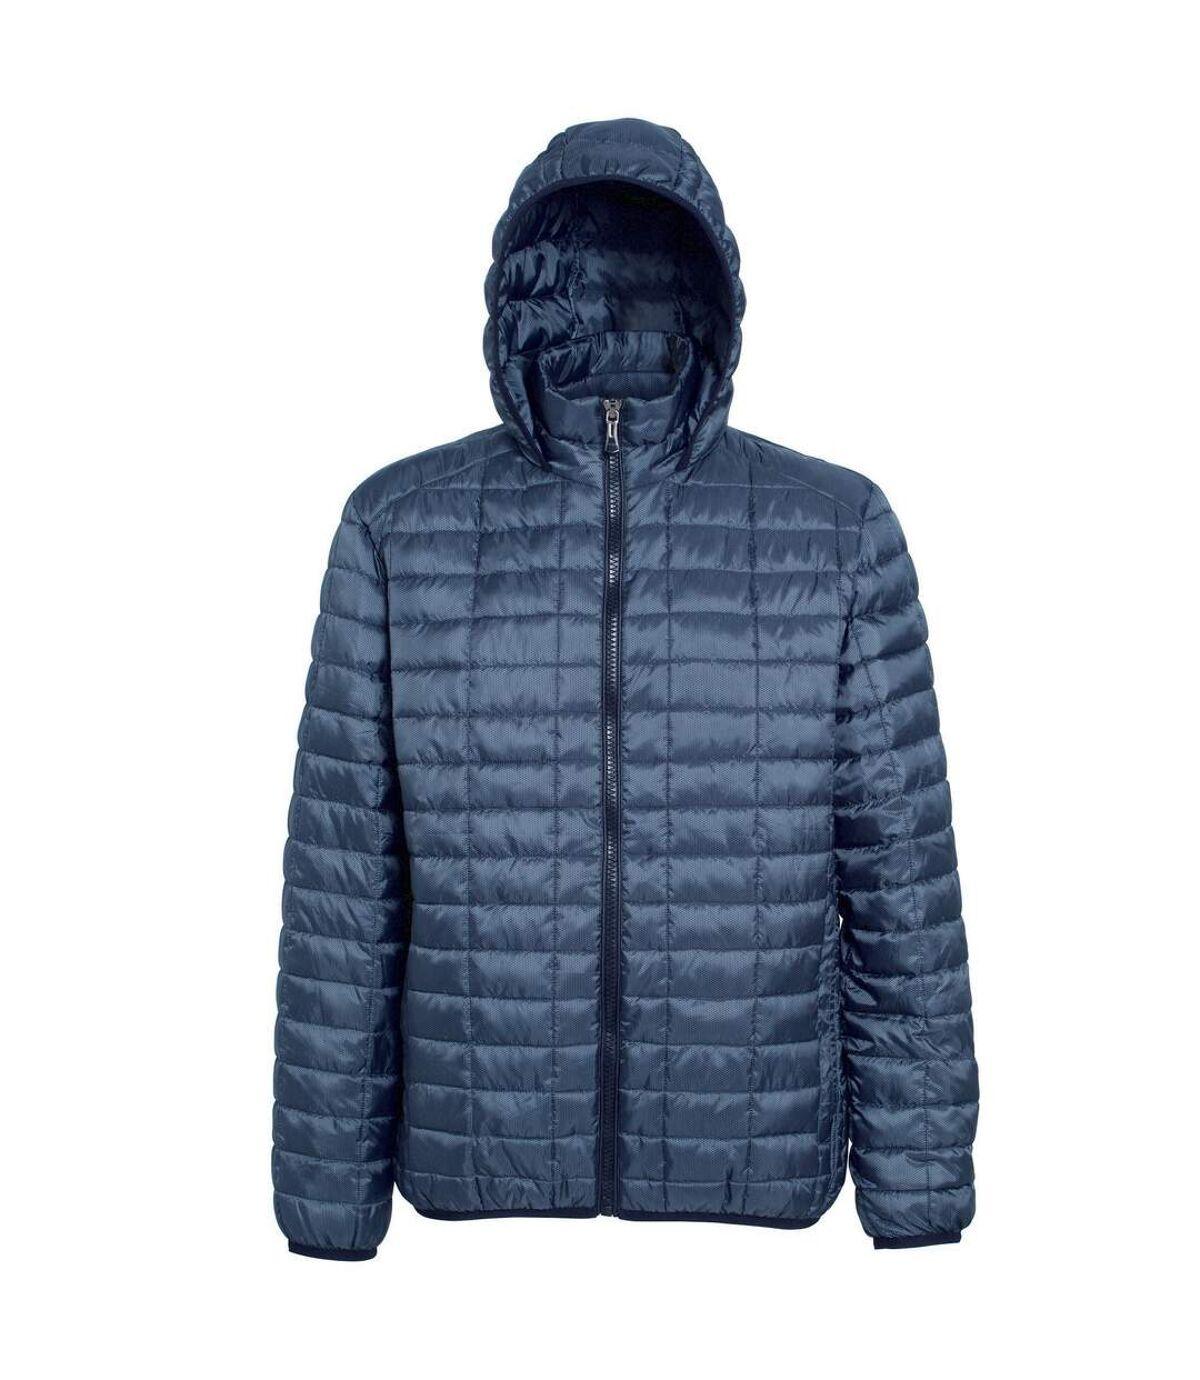 2786 Mens Honeycomb Padded Hooded Jacket (Steel) - UTRW5018